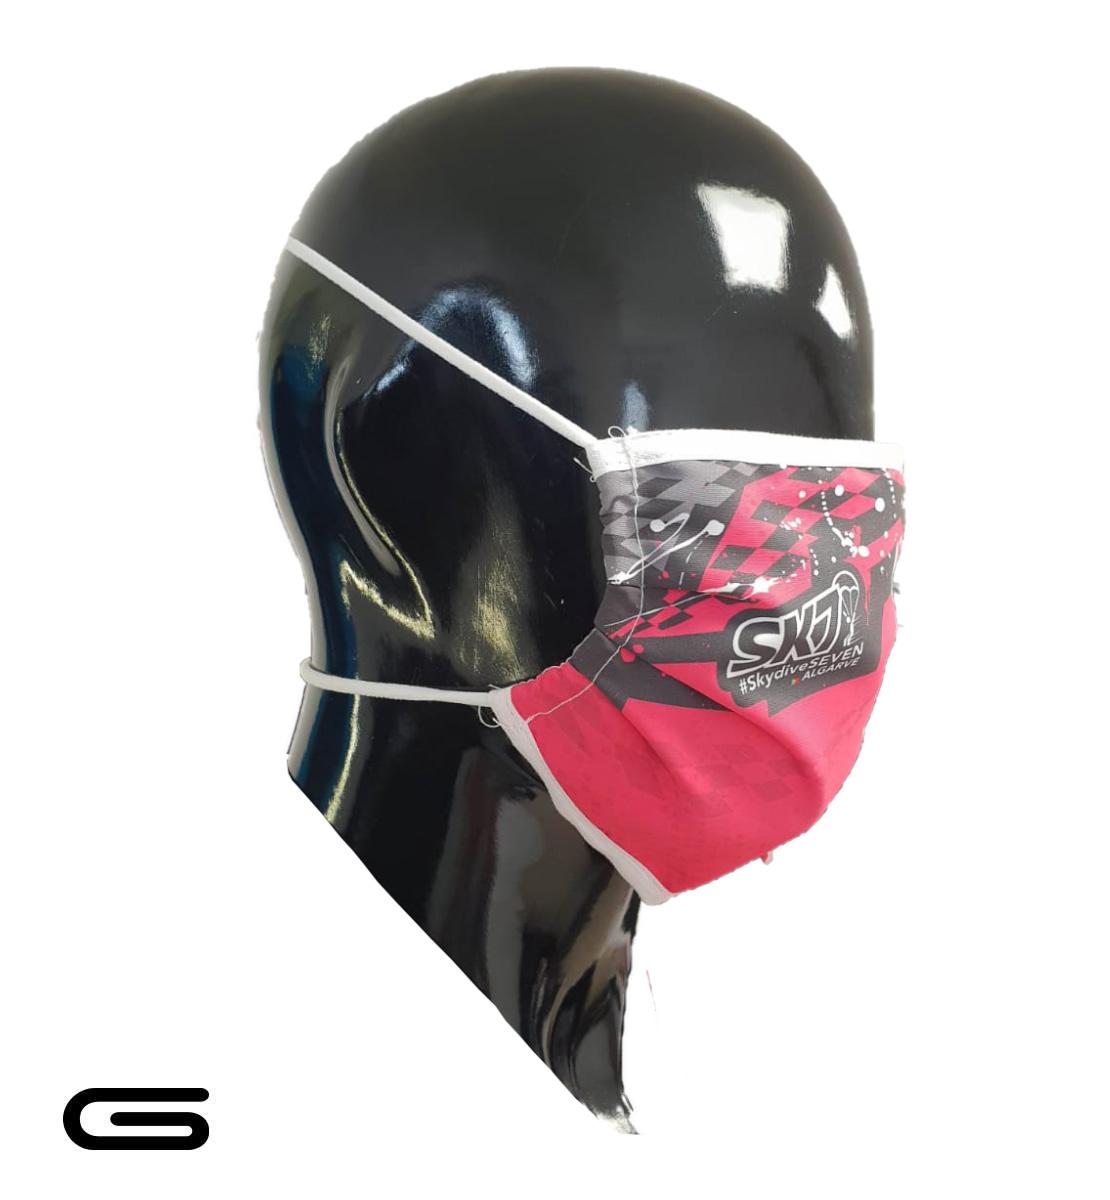 Street mask